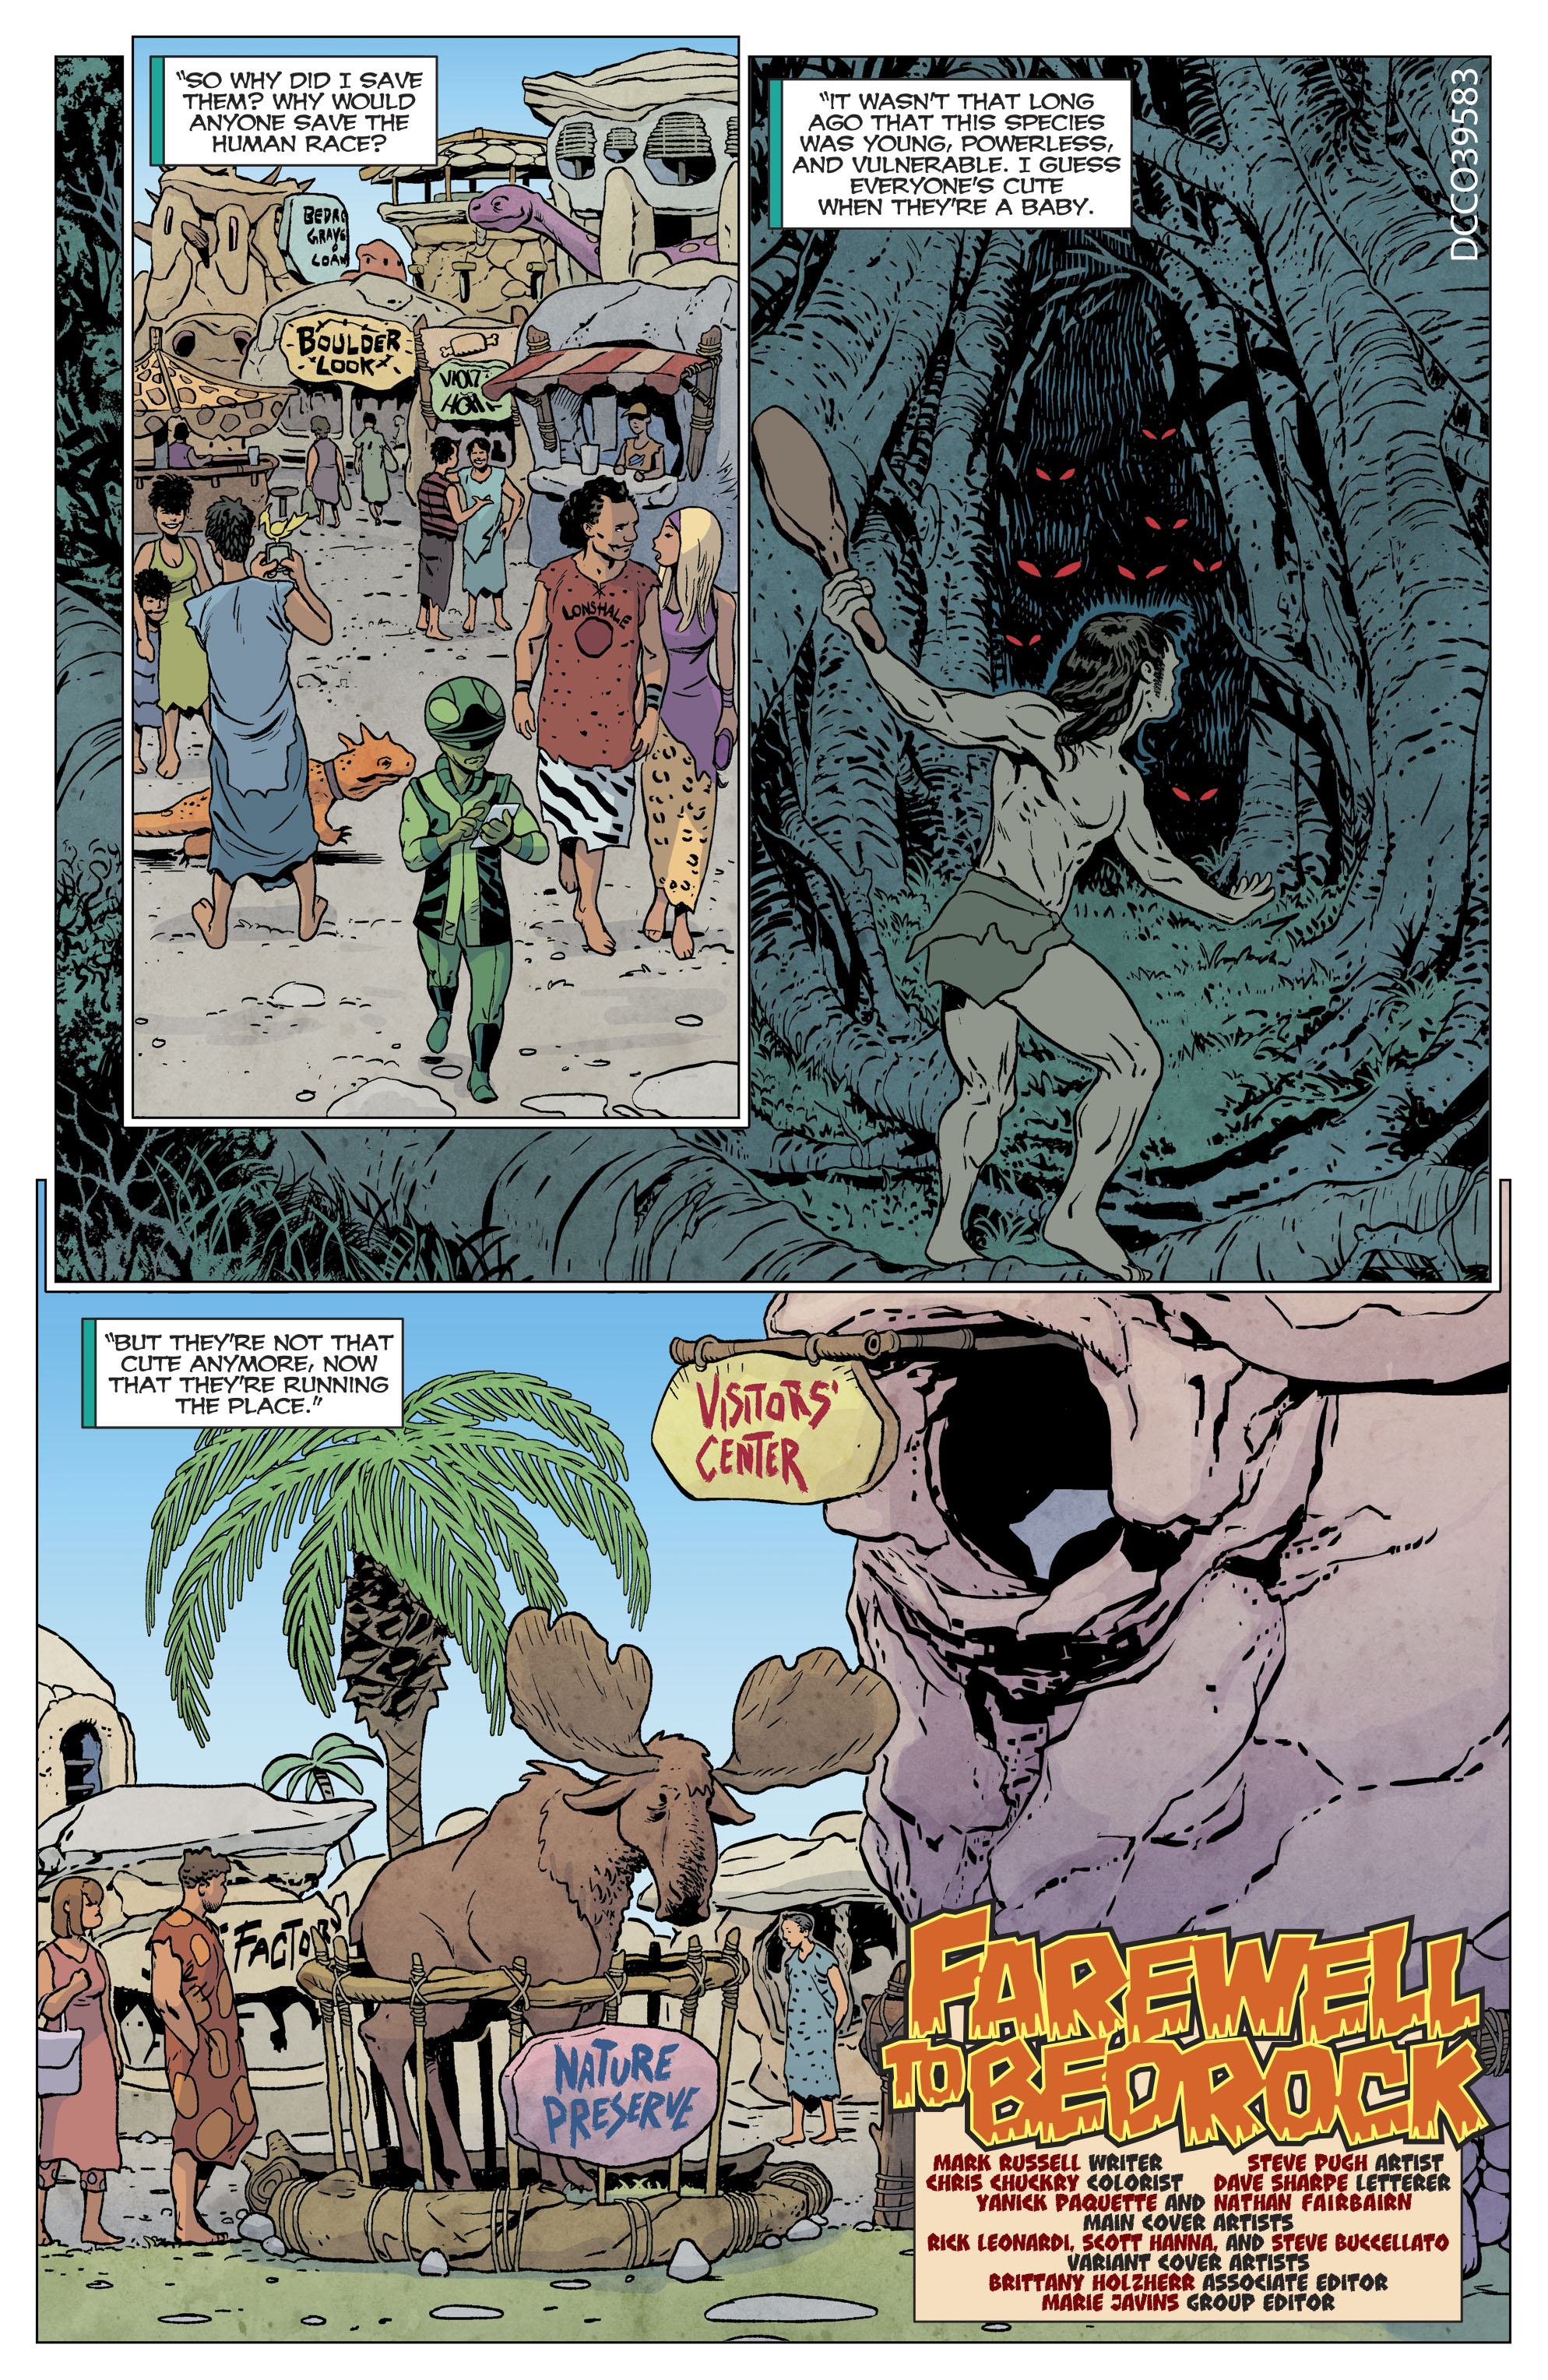 Read online The Flintstones comic -  Issue #12 - 4